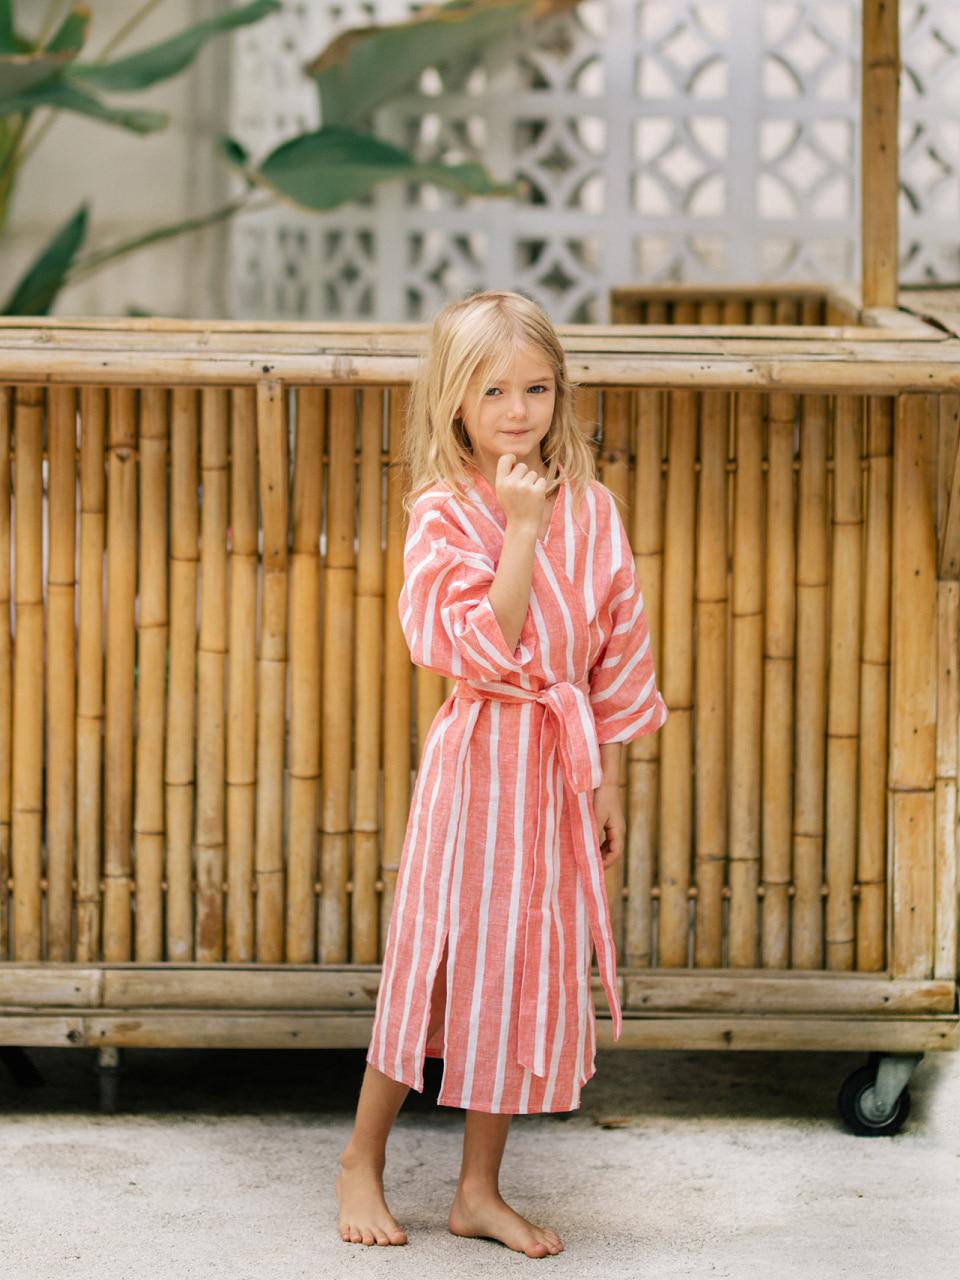 CORAL STRIPE ROBE_KIDSswimwear,수영복,비키니,데이즈데이즈,dazedayz,디자이너수영복,스윔웨어